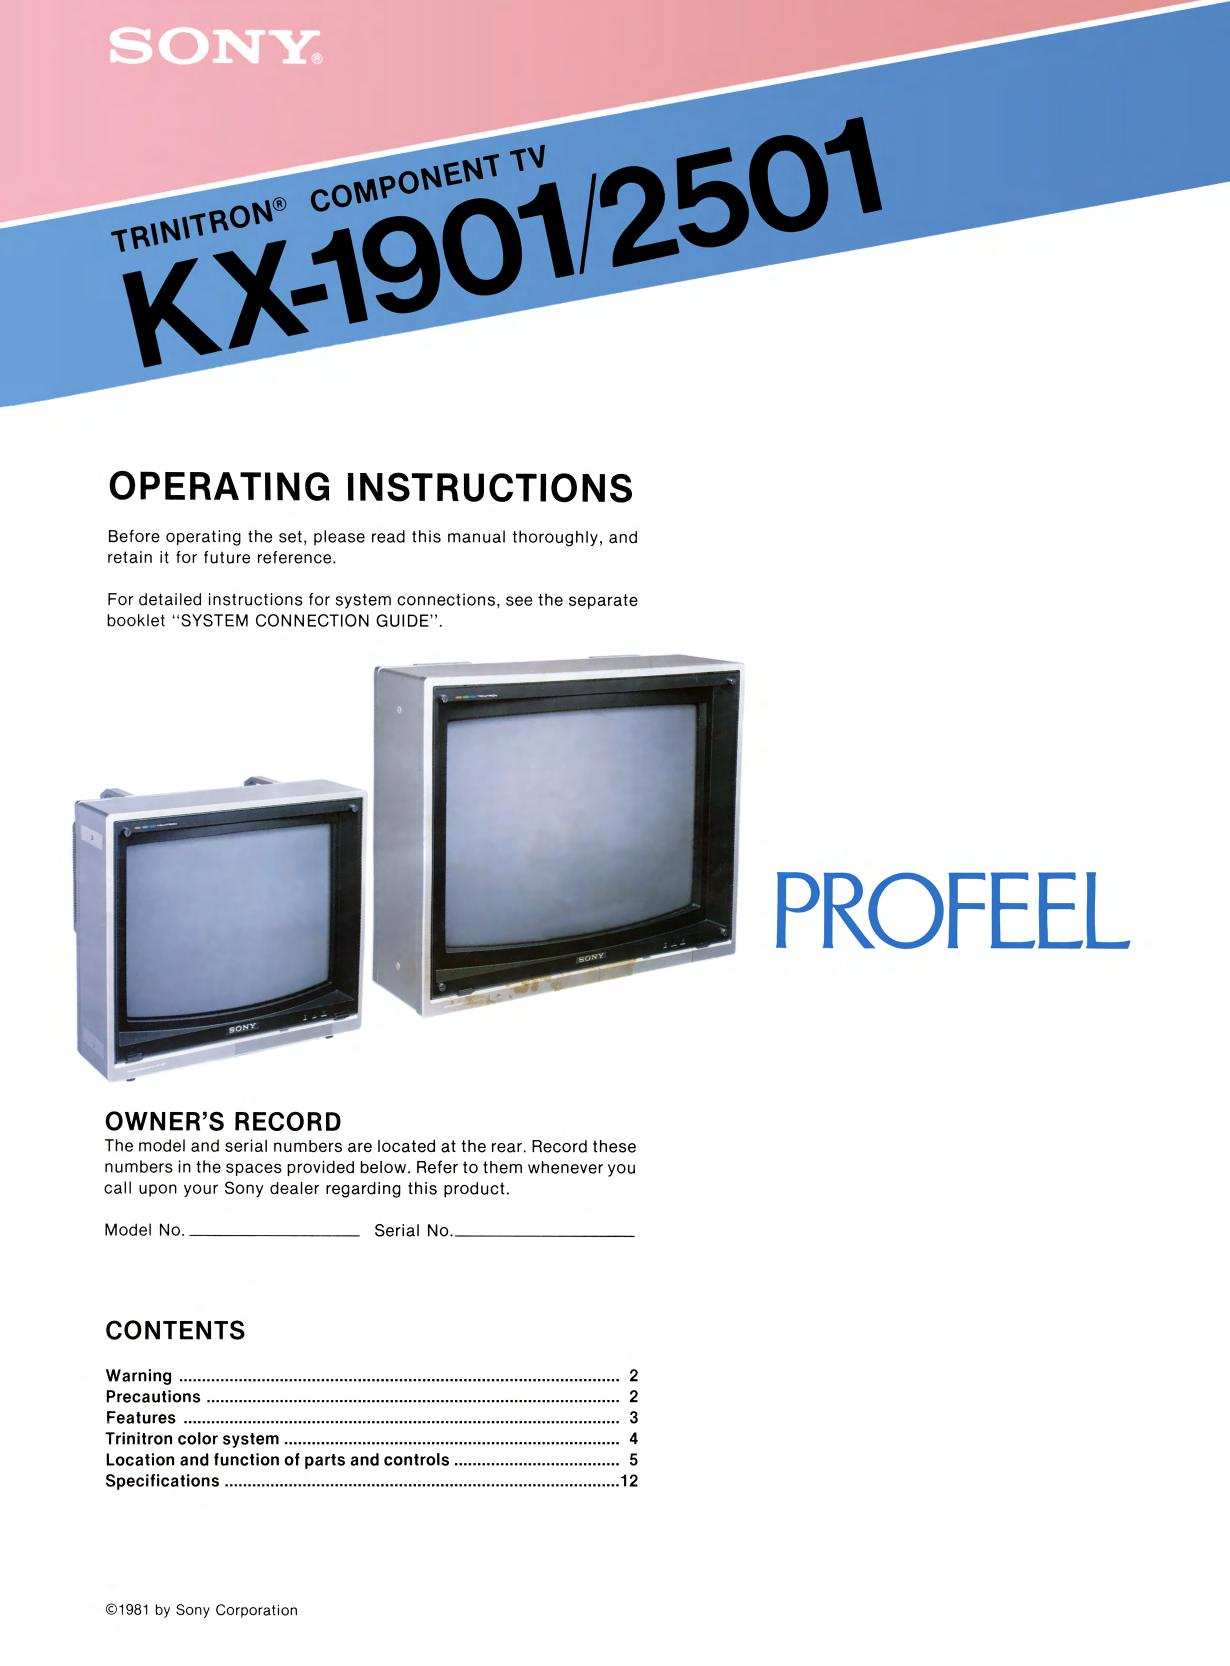 Sony Trinitron Component TV Profeel Series Models KX